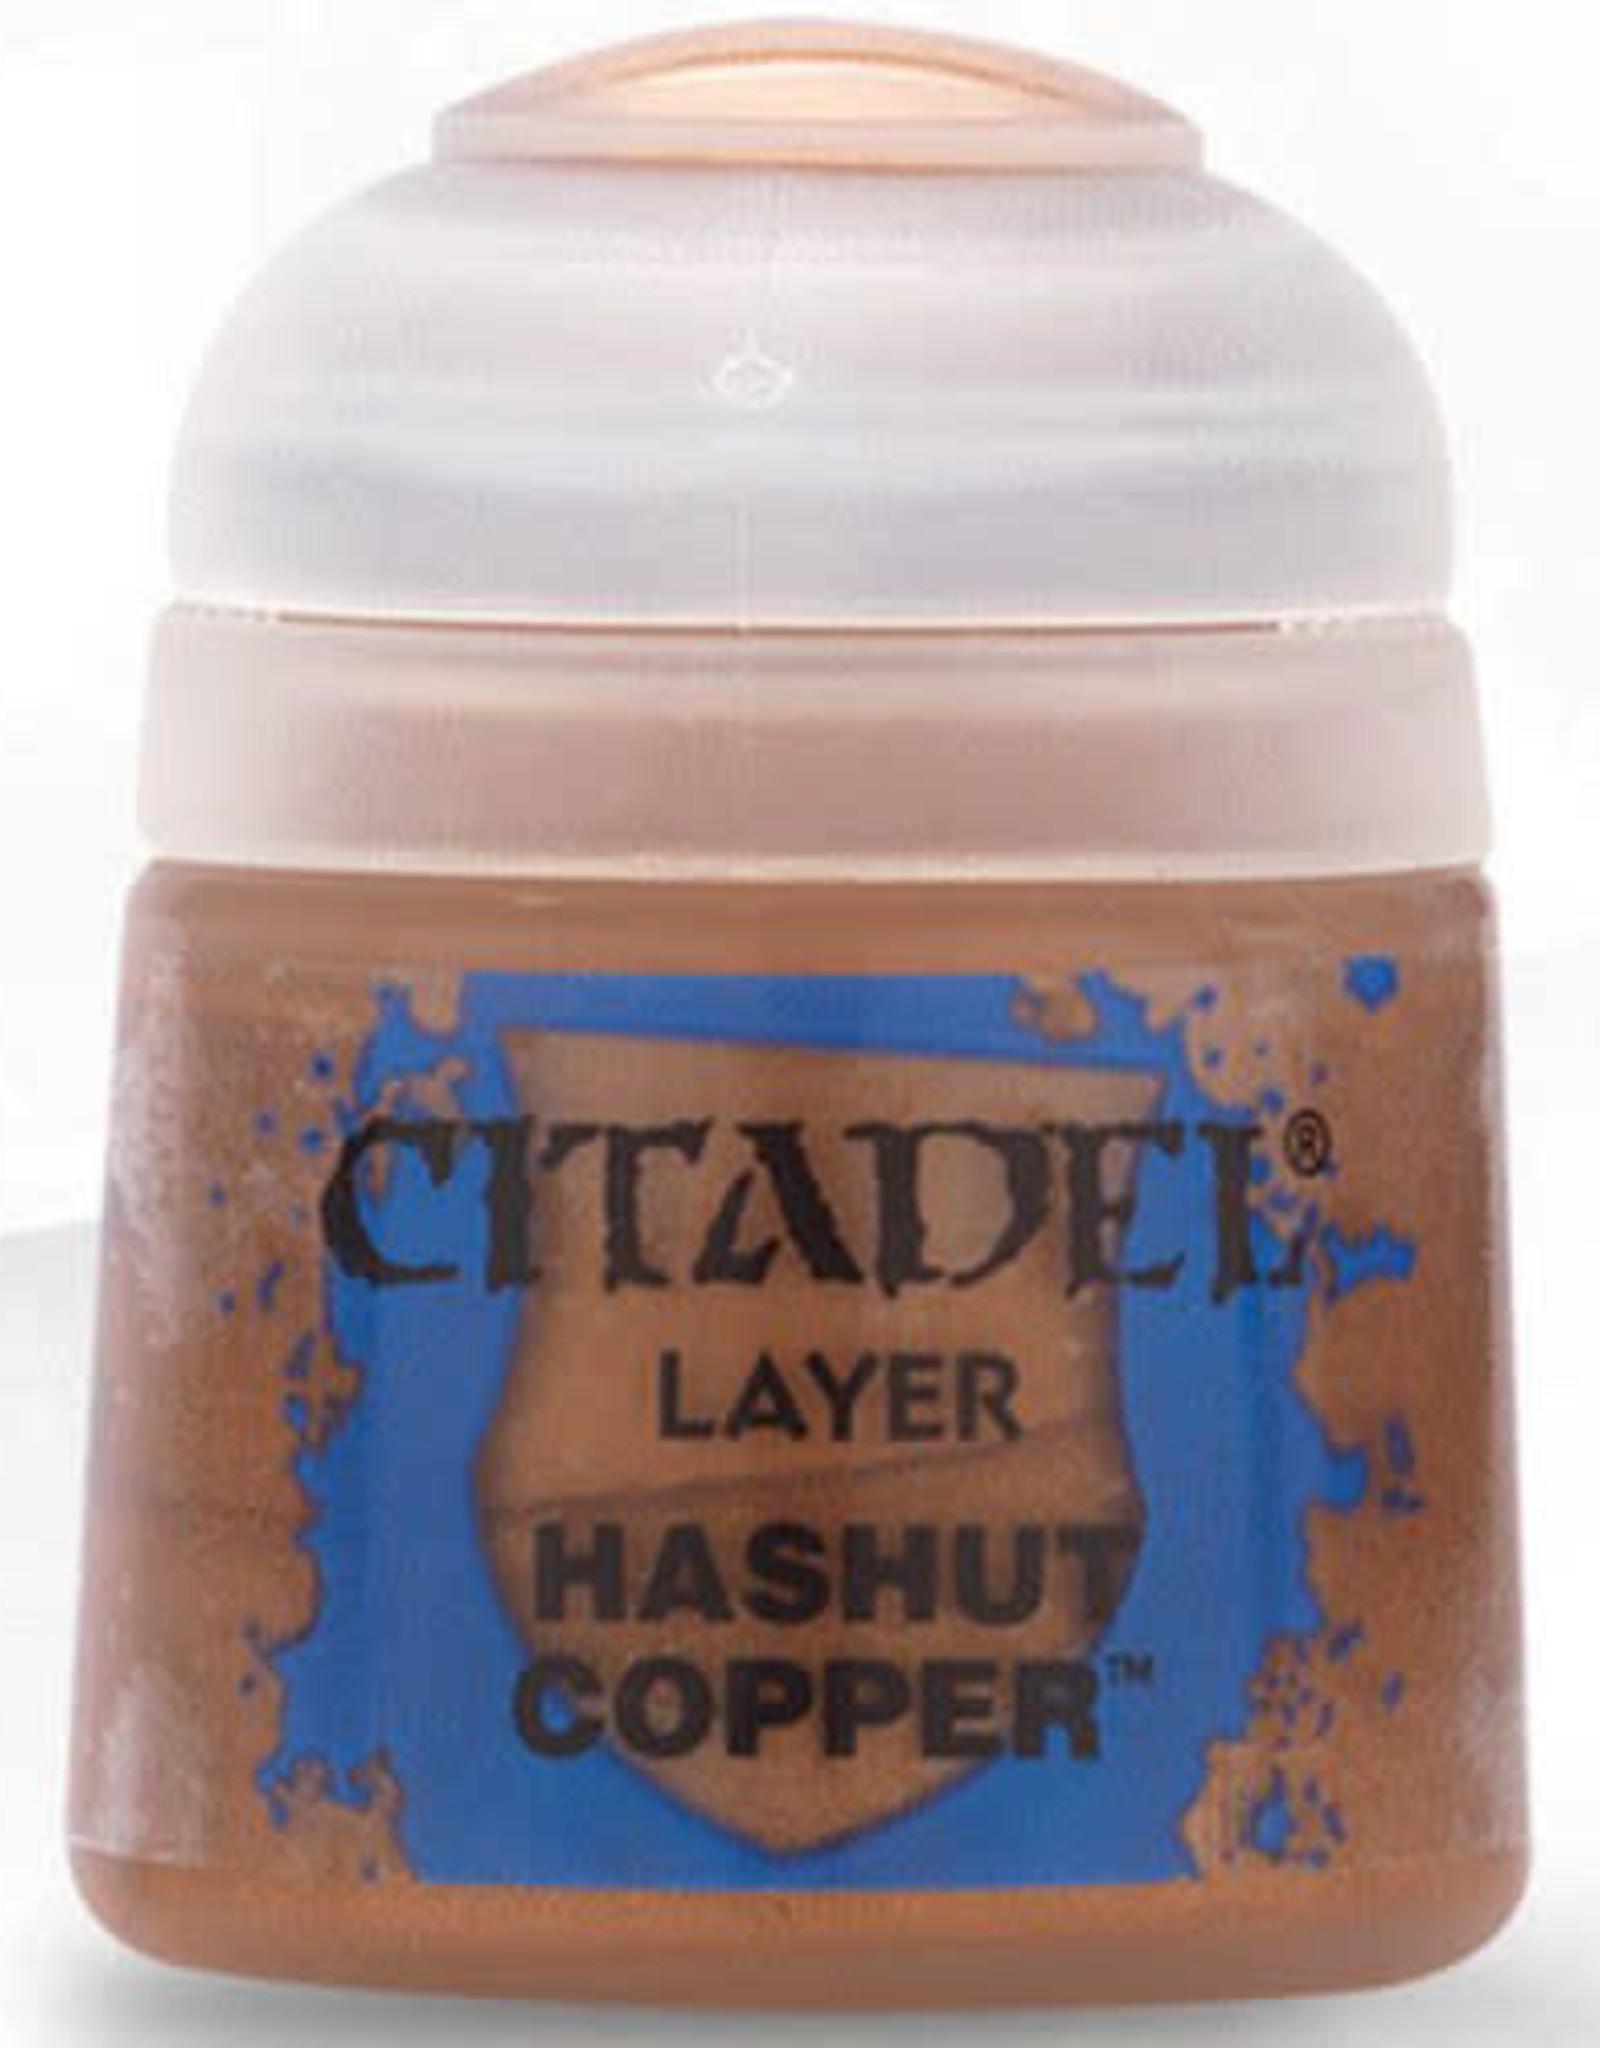 Citadel Layer Paint: Hashut Copper (12ml)